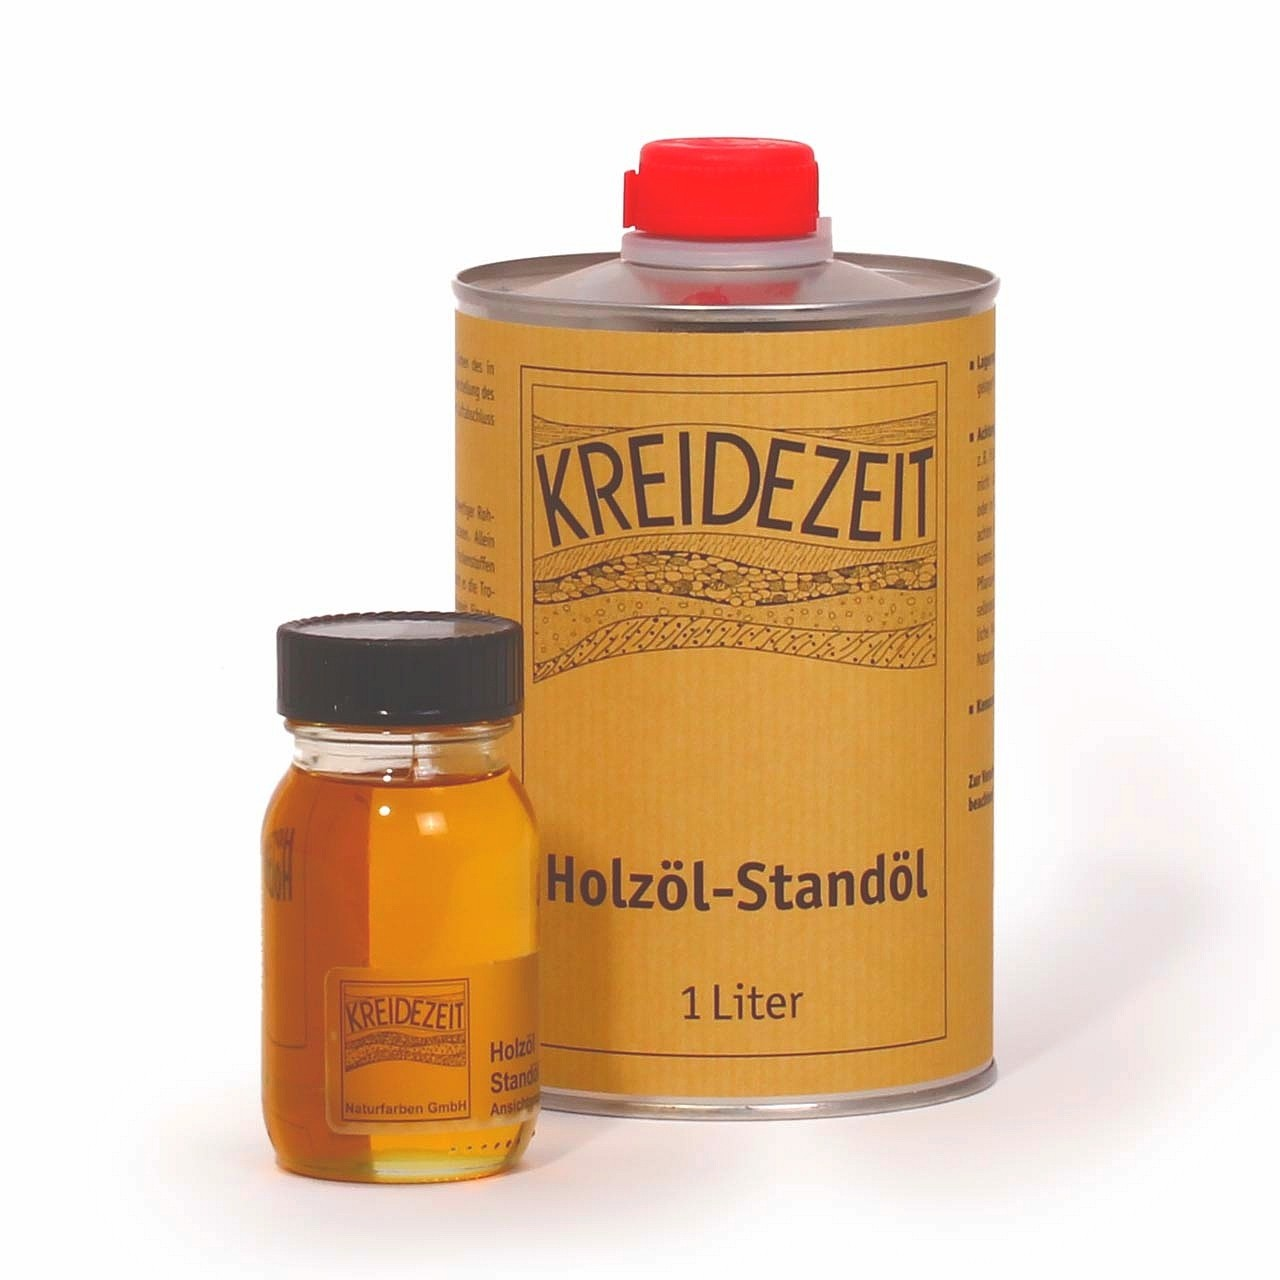 Kreidezeit Holzöl-Standöl 1 Liter